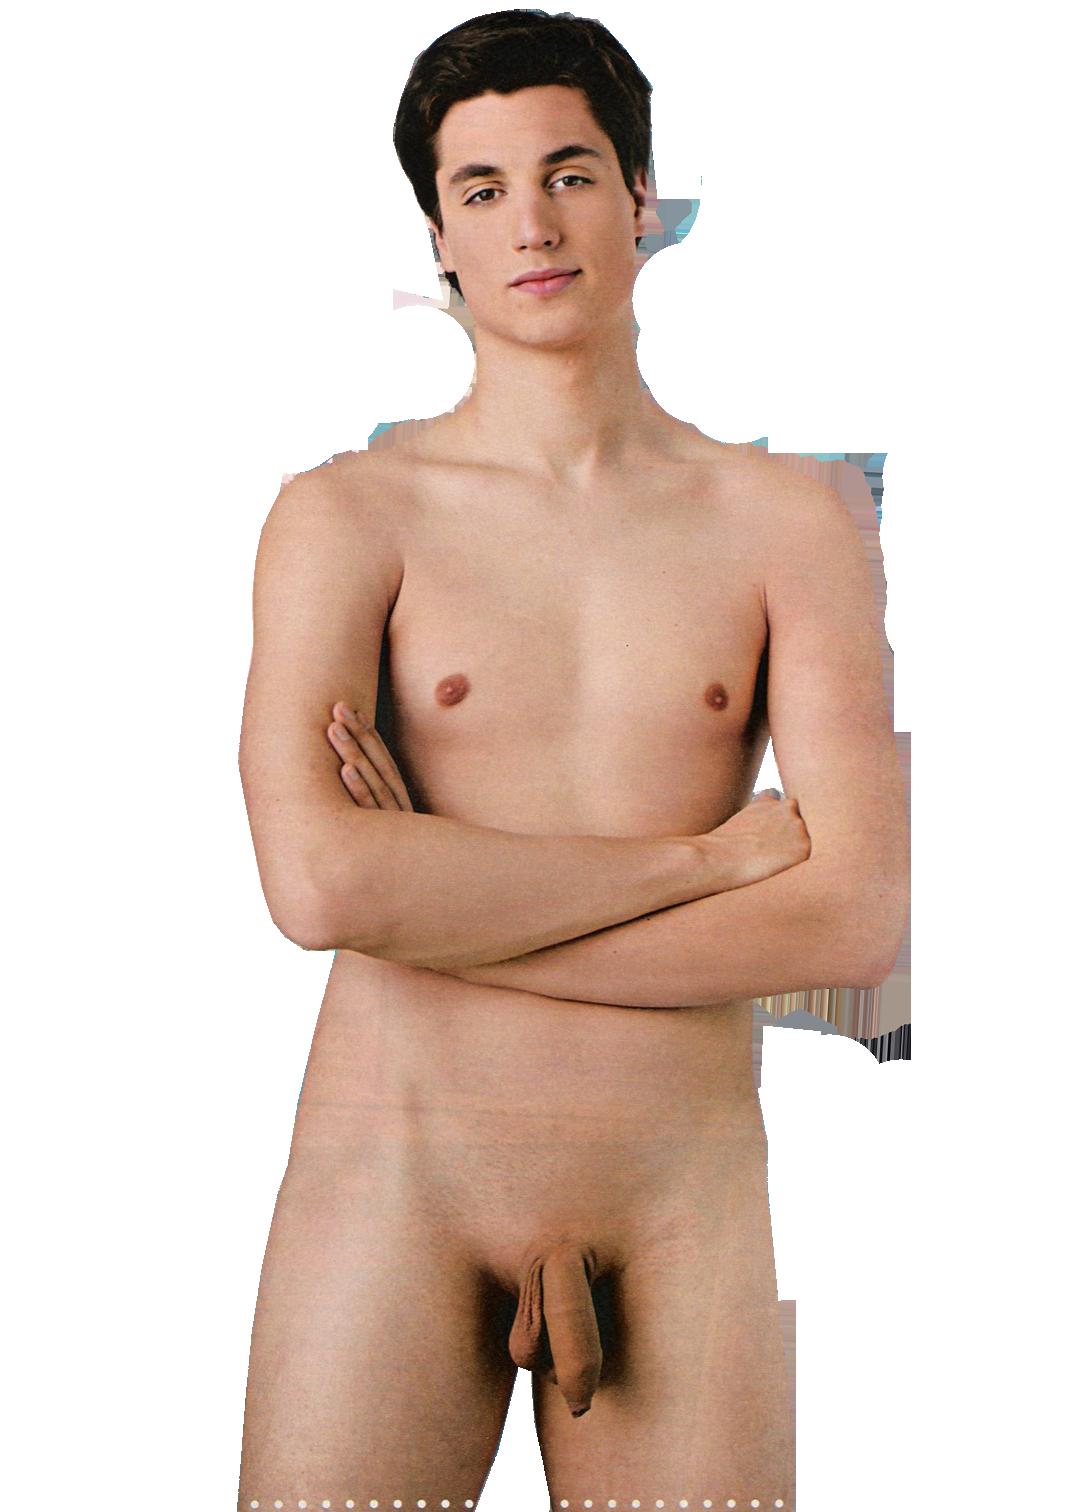 male human nude frontal anatomy model: vasco | naked guys